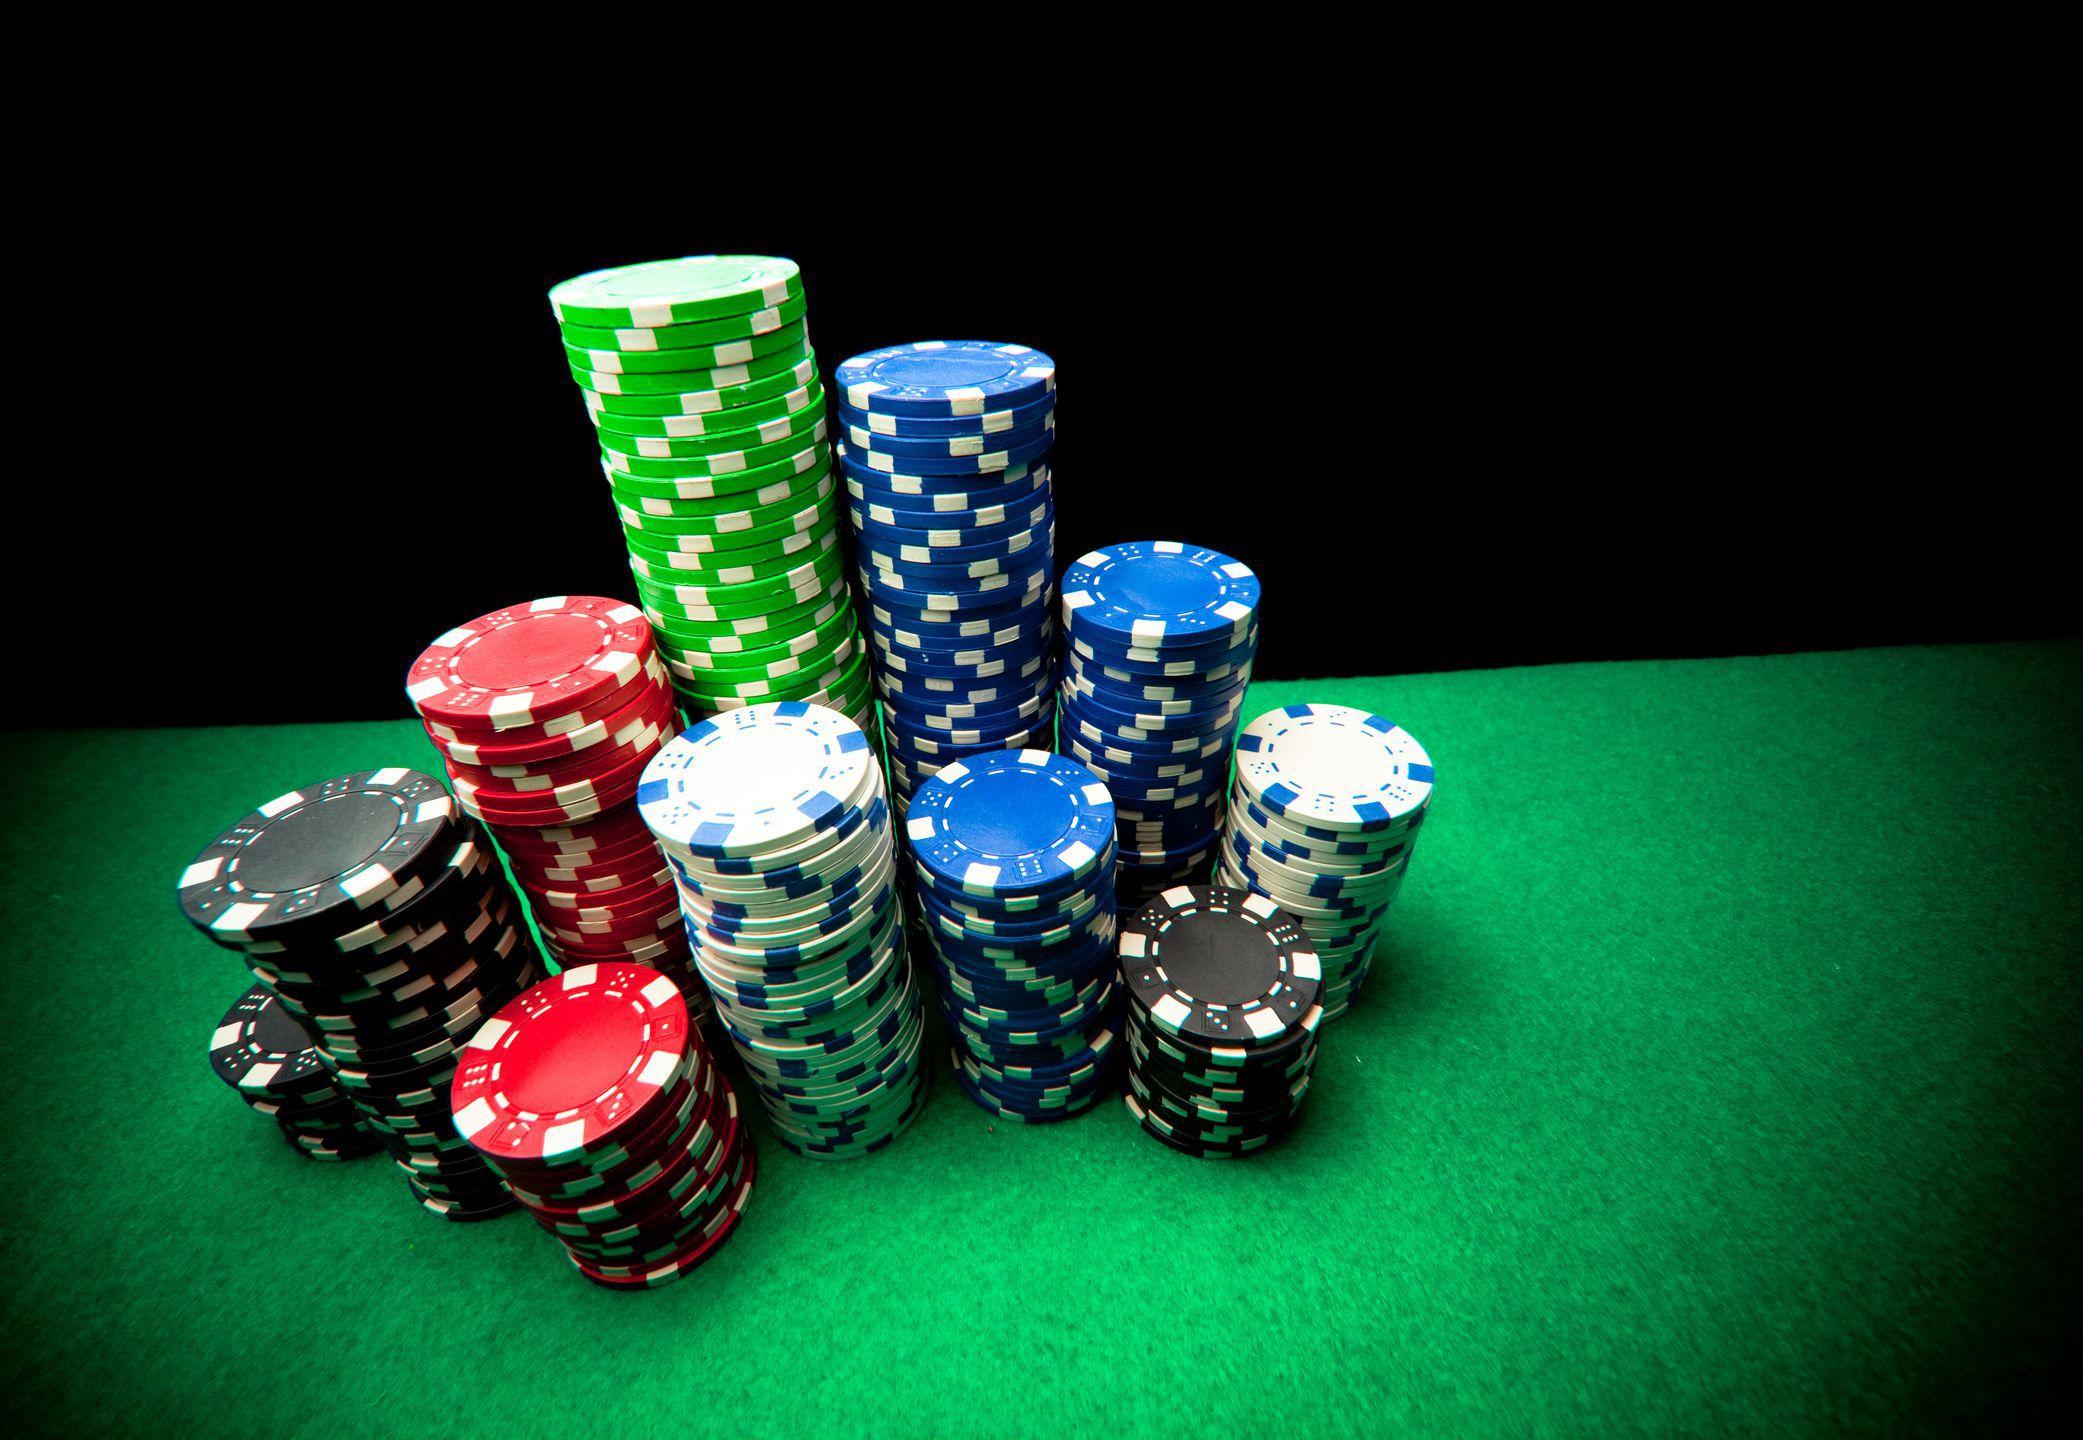 Стек фишек для покера